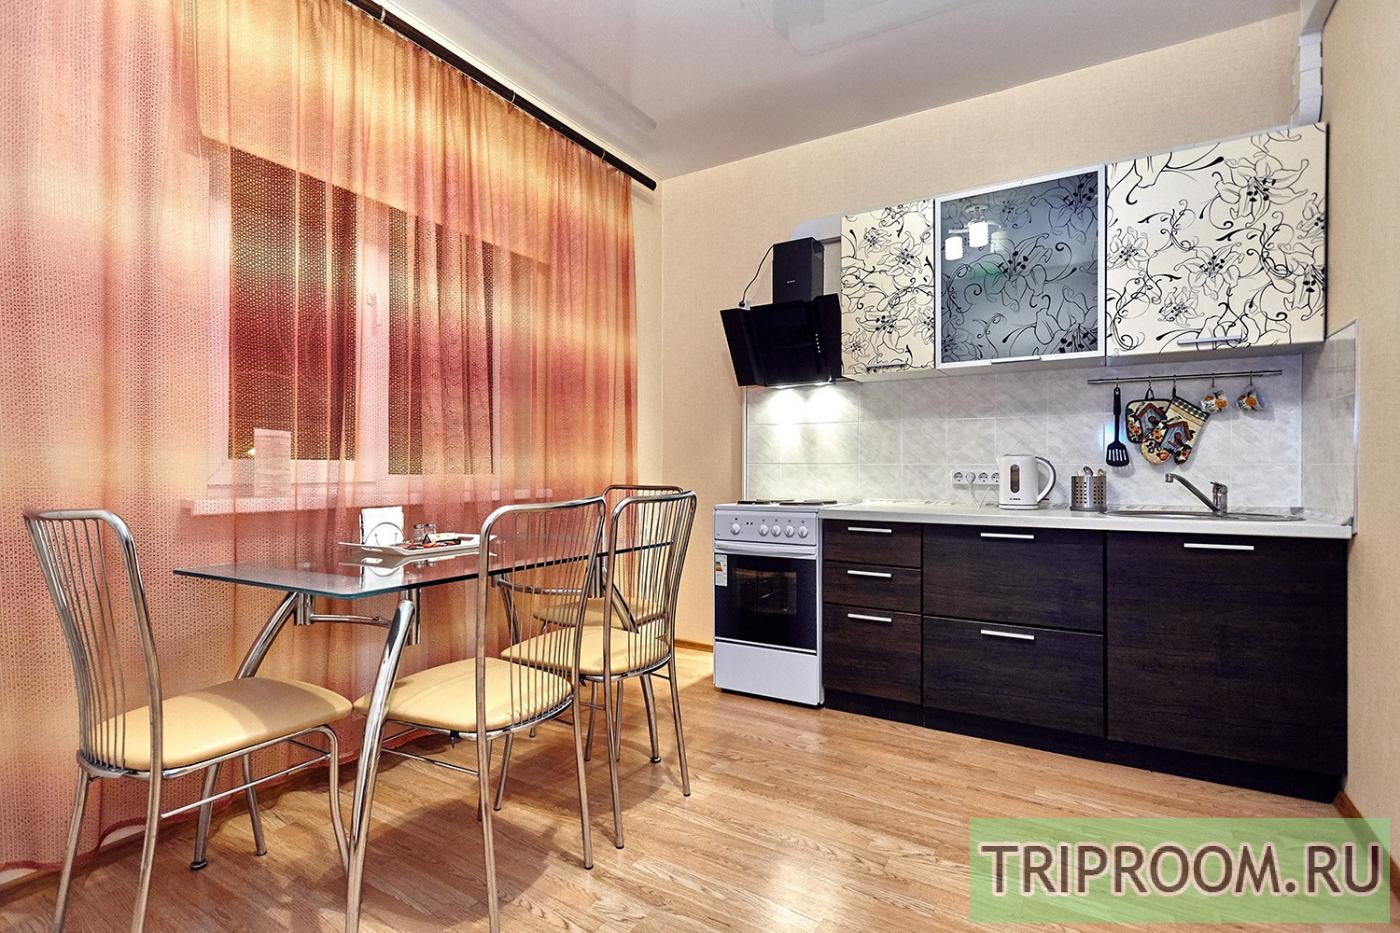 2-комнатная квартира посуточно (вариант № 10581), ул. Соколова улица, фото № 8